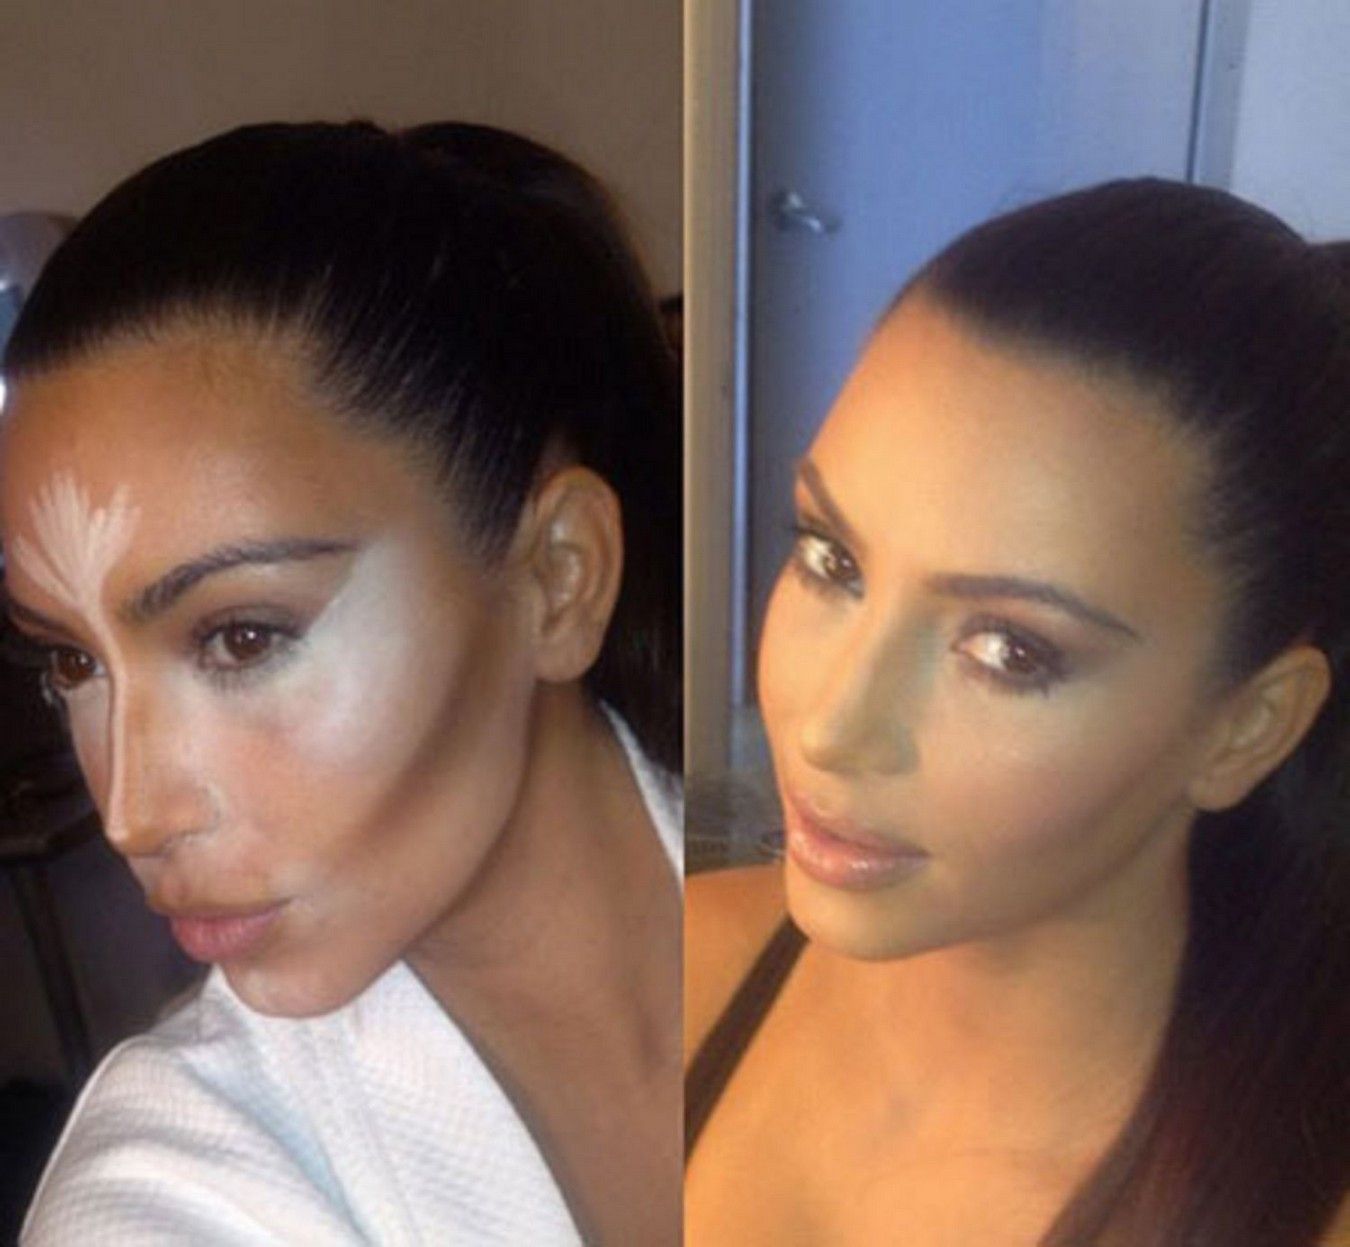 Diy perfect makeup contouring 00009 Unique Ideas Kim